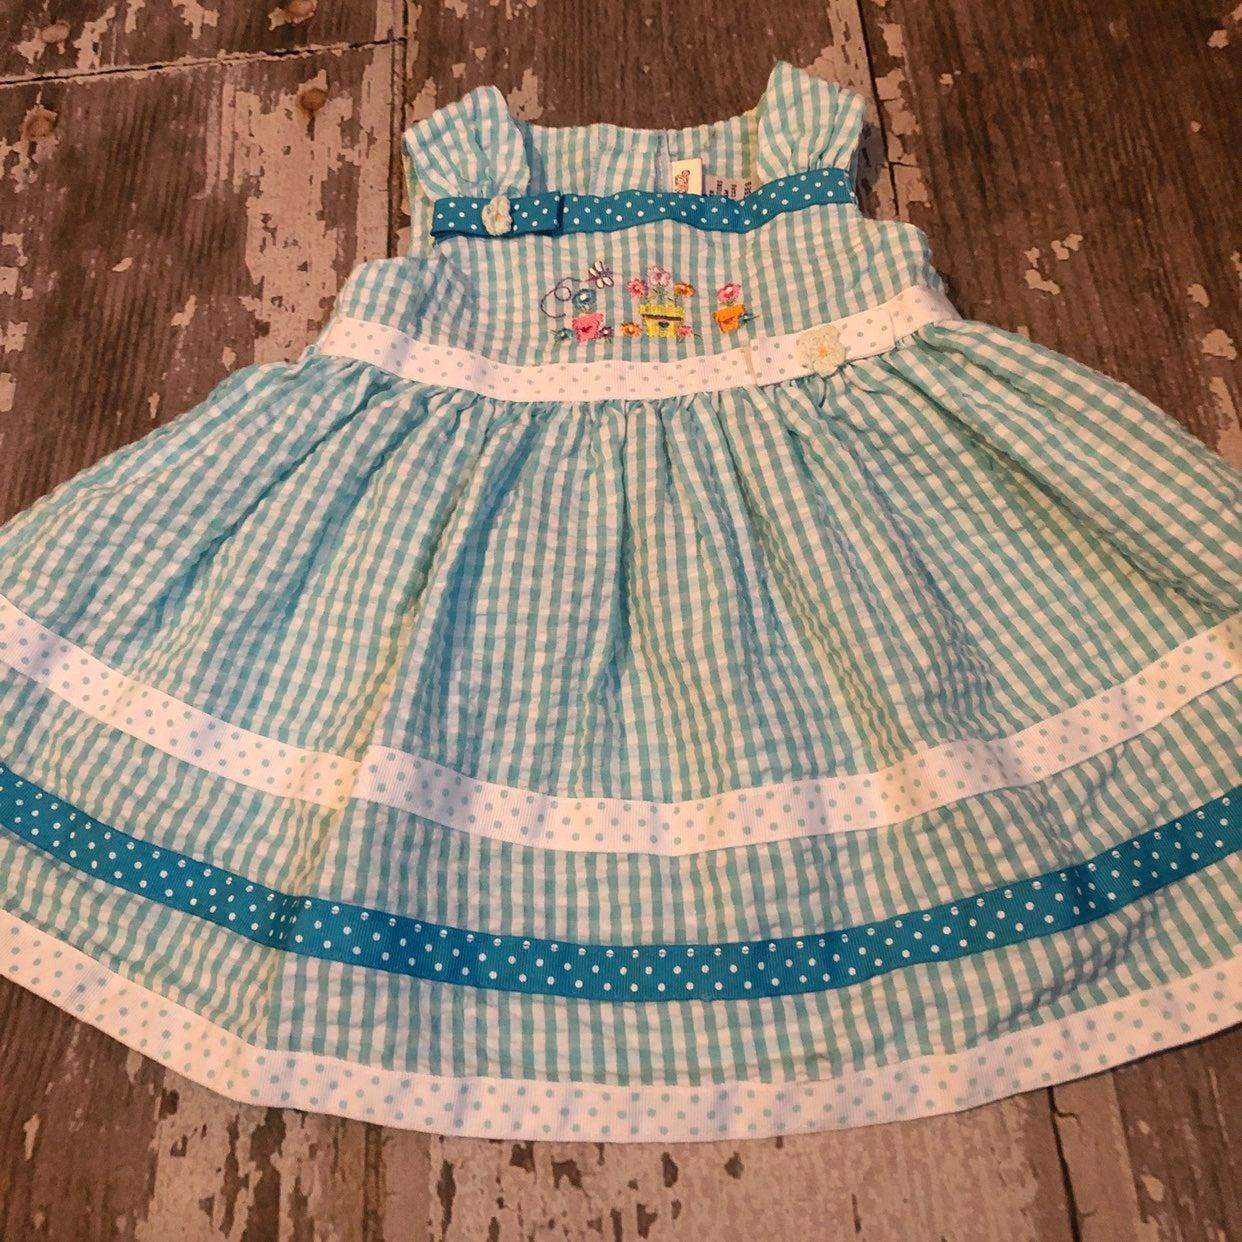 Aqua Gingham Seersucker Dress 12 months